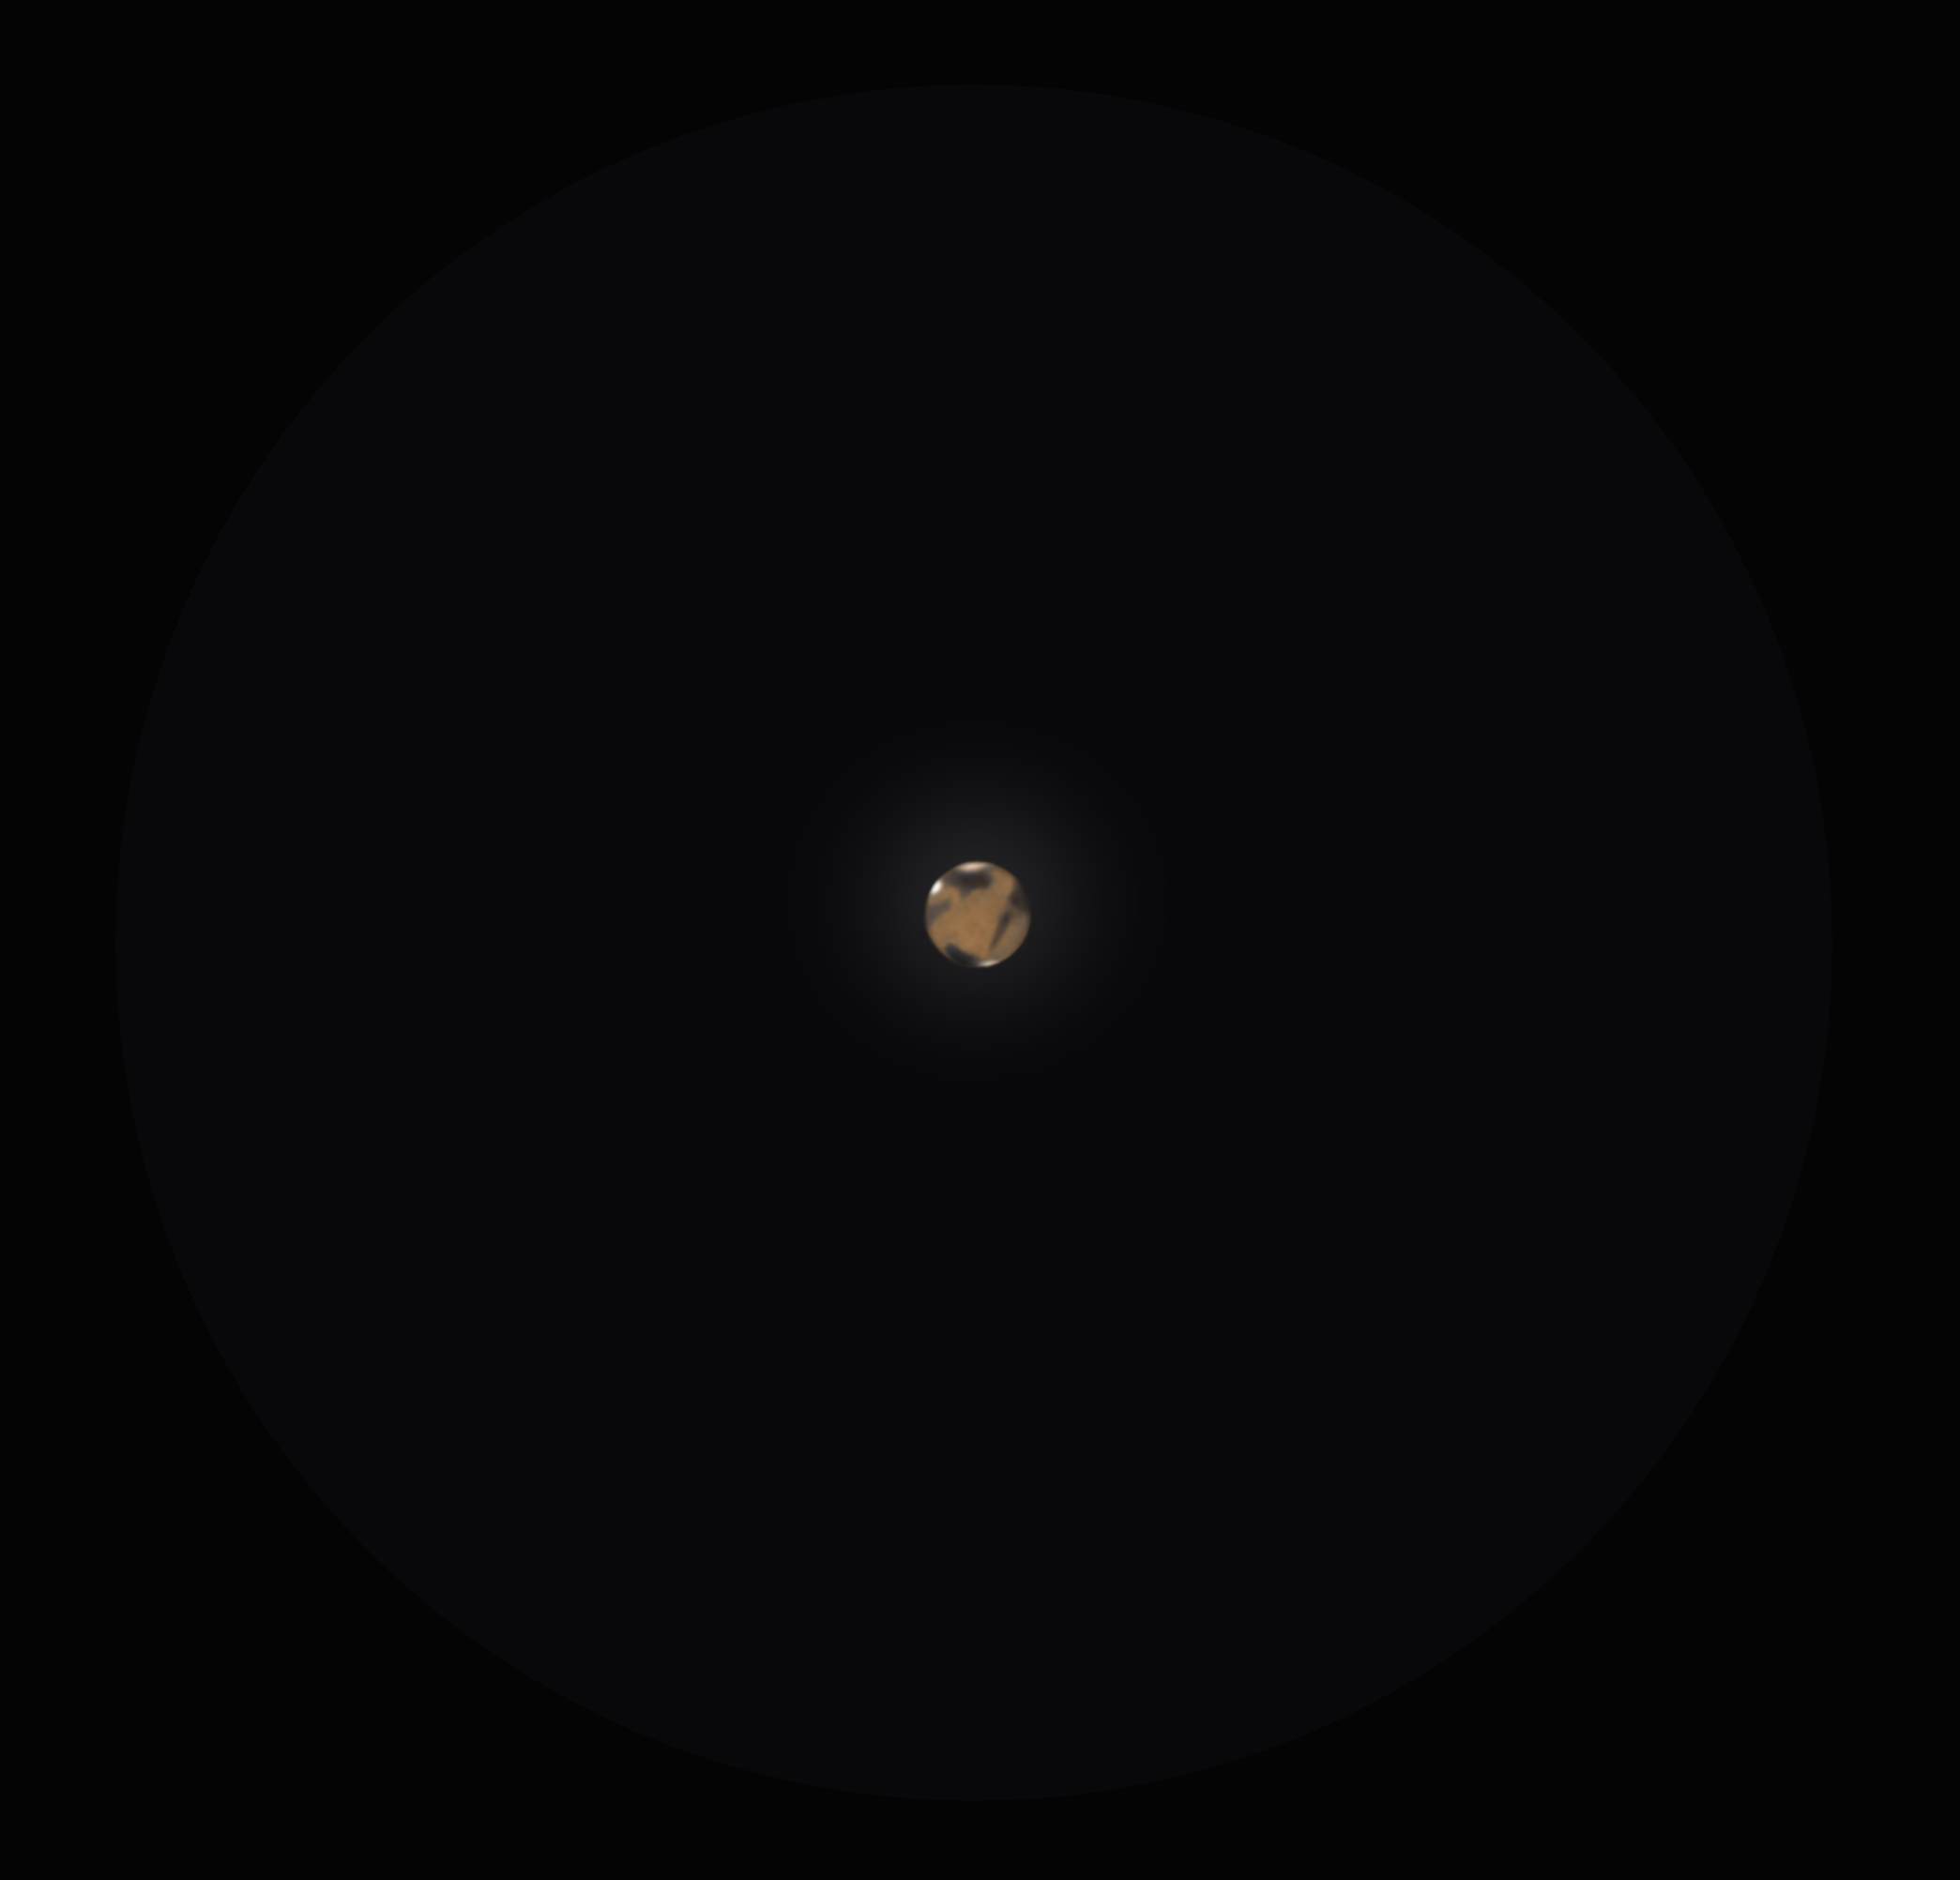 Mars opposition 11-04-2014